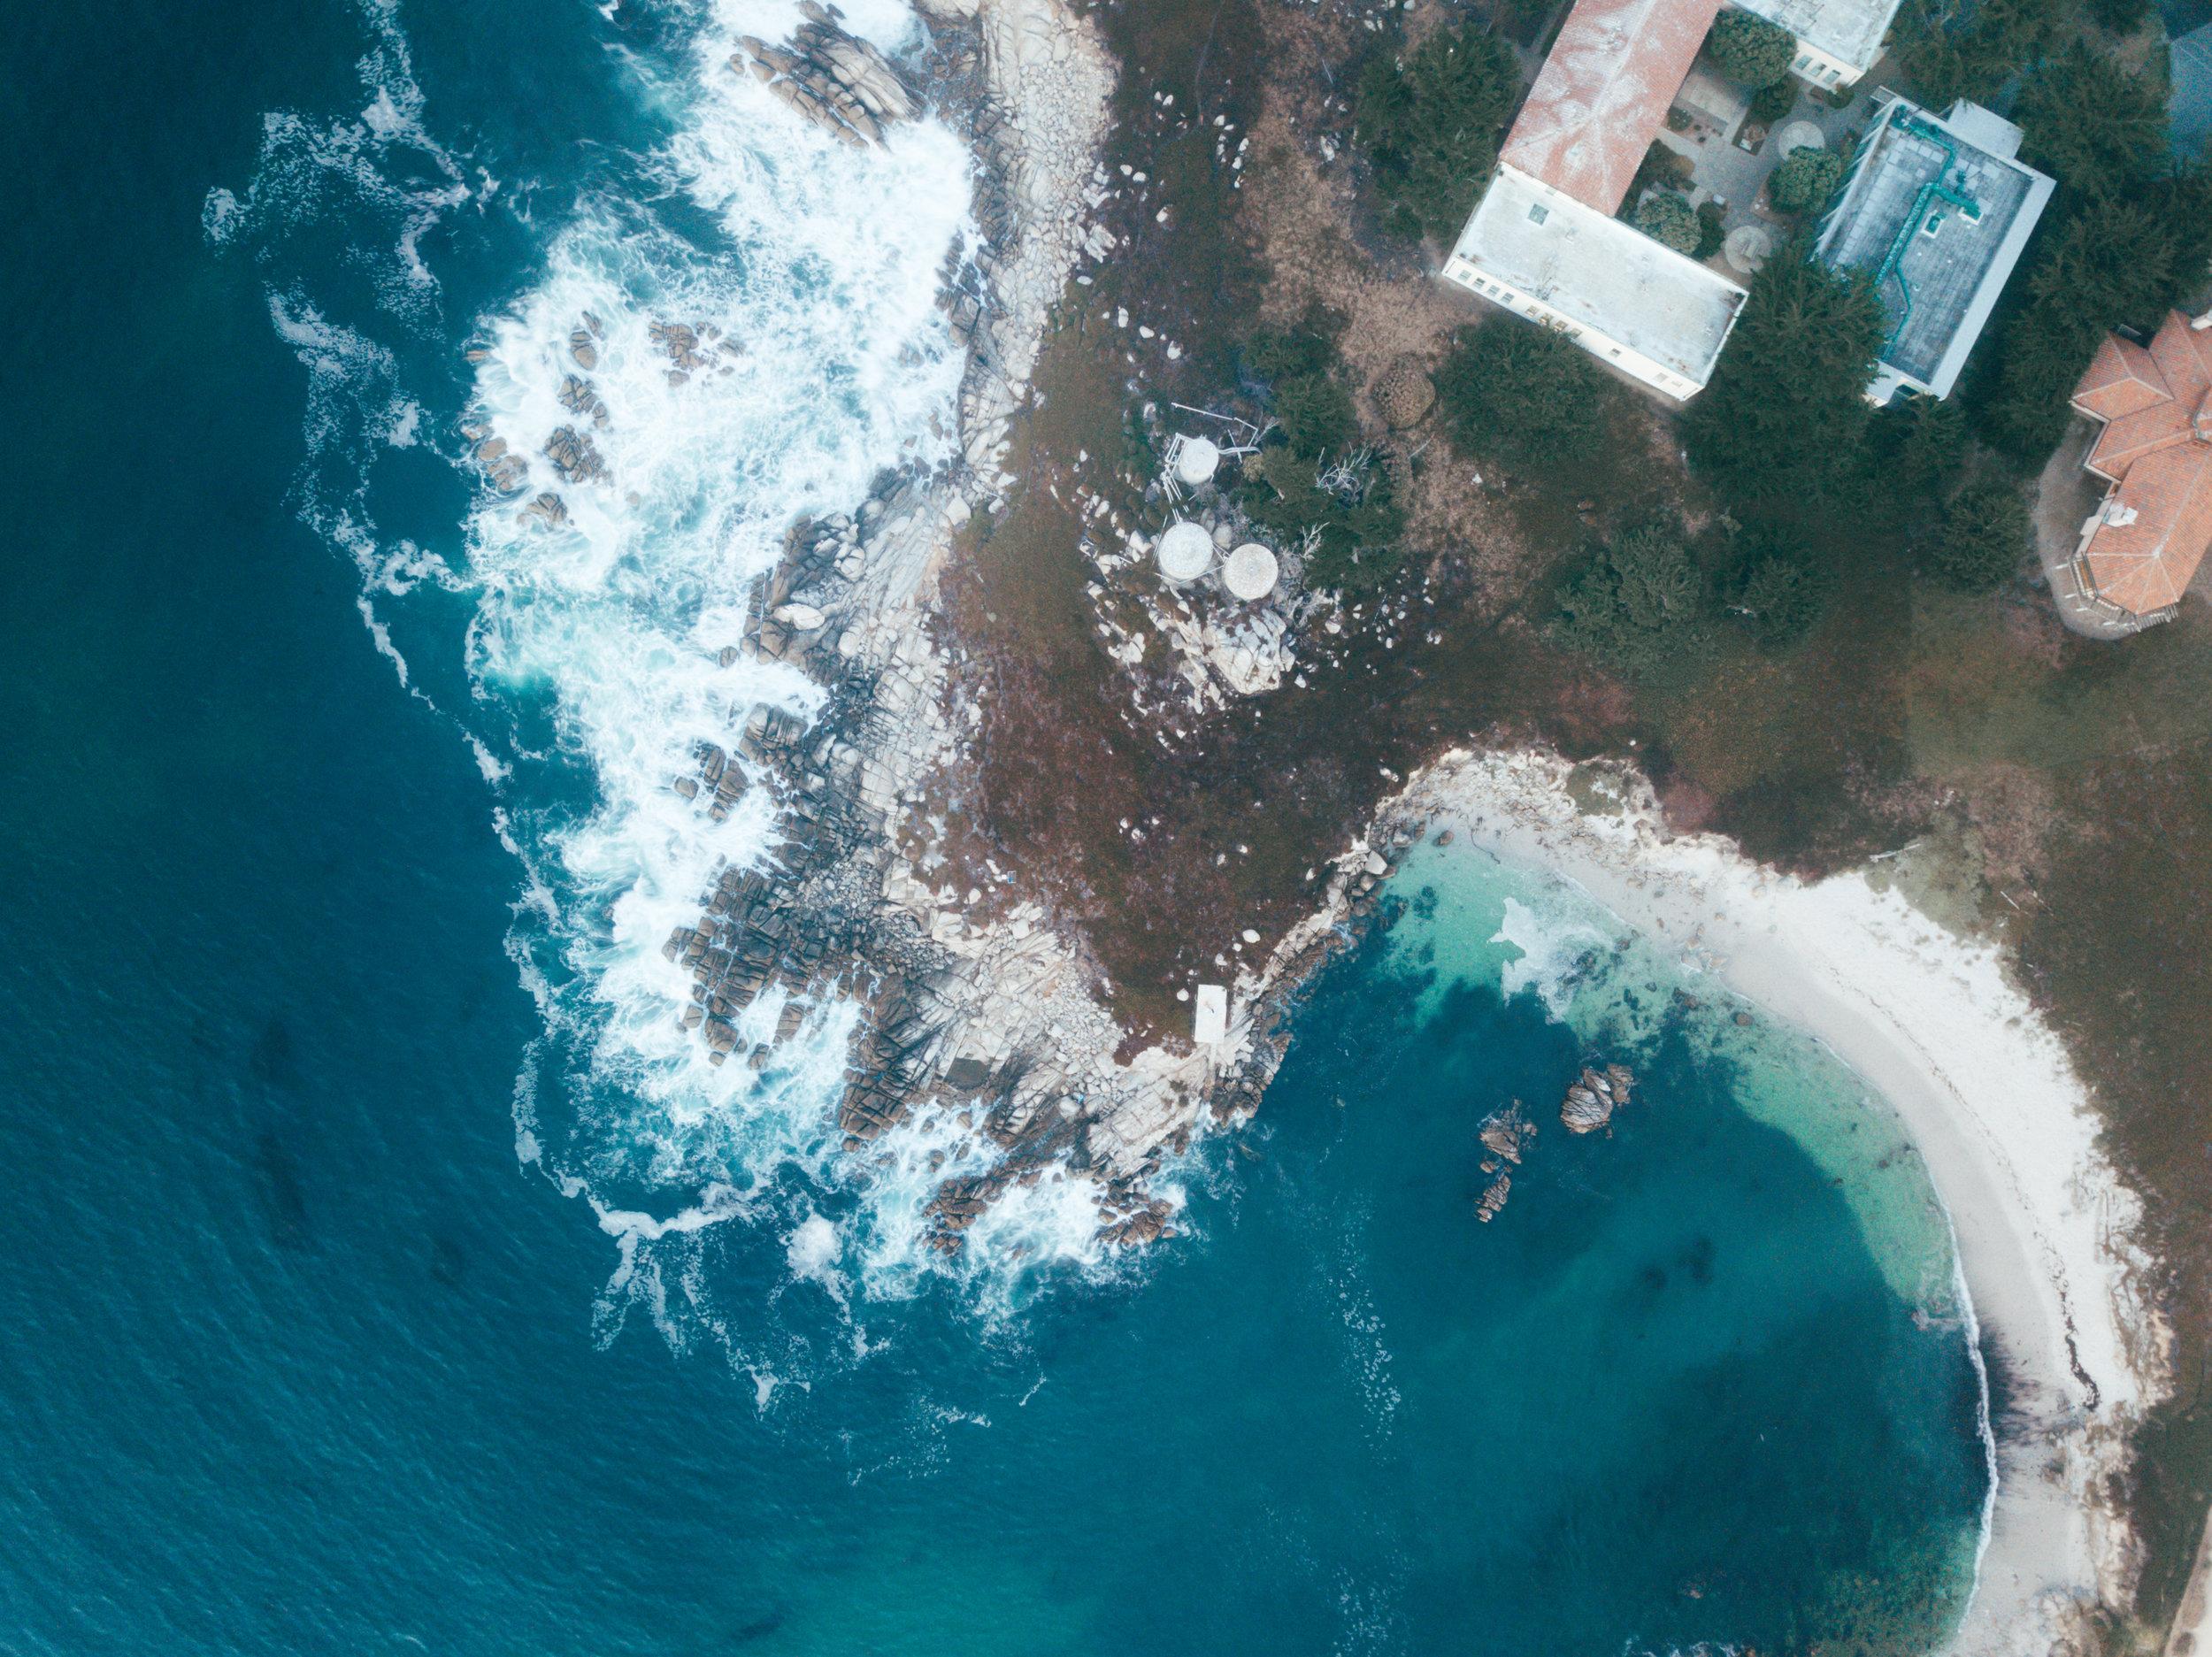 Stay_Driven_Monterey_Drone-1-4.jpg